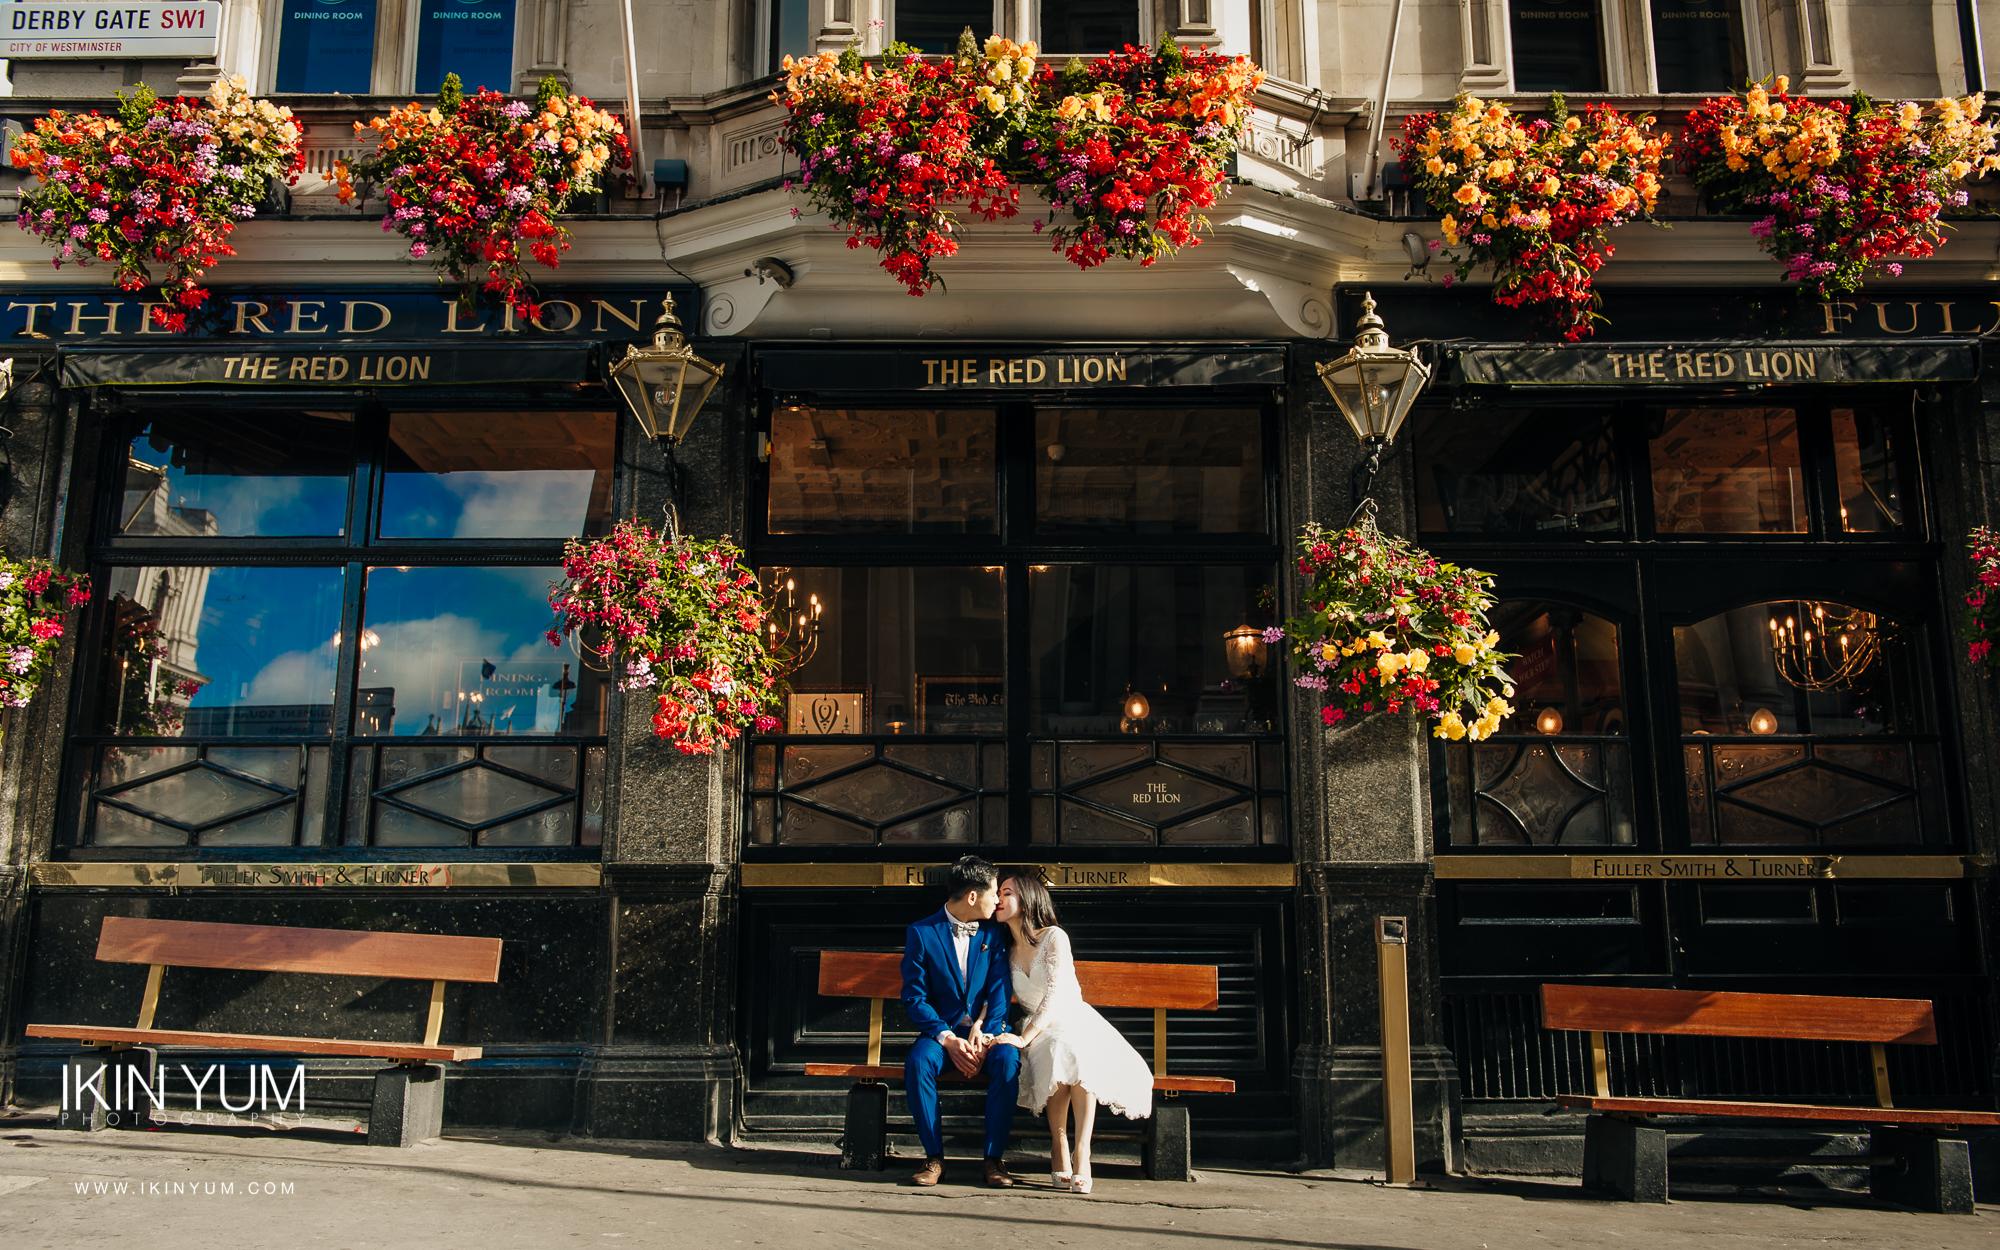 Natalie & Duncan Wedding Day - Ikin Yum Photography-035.jpg